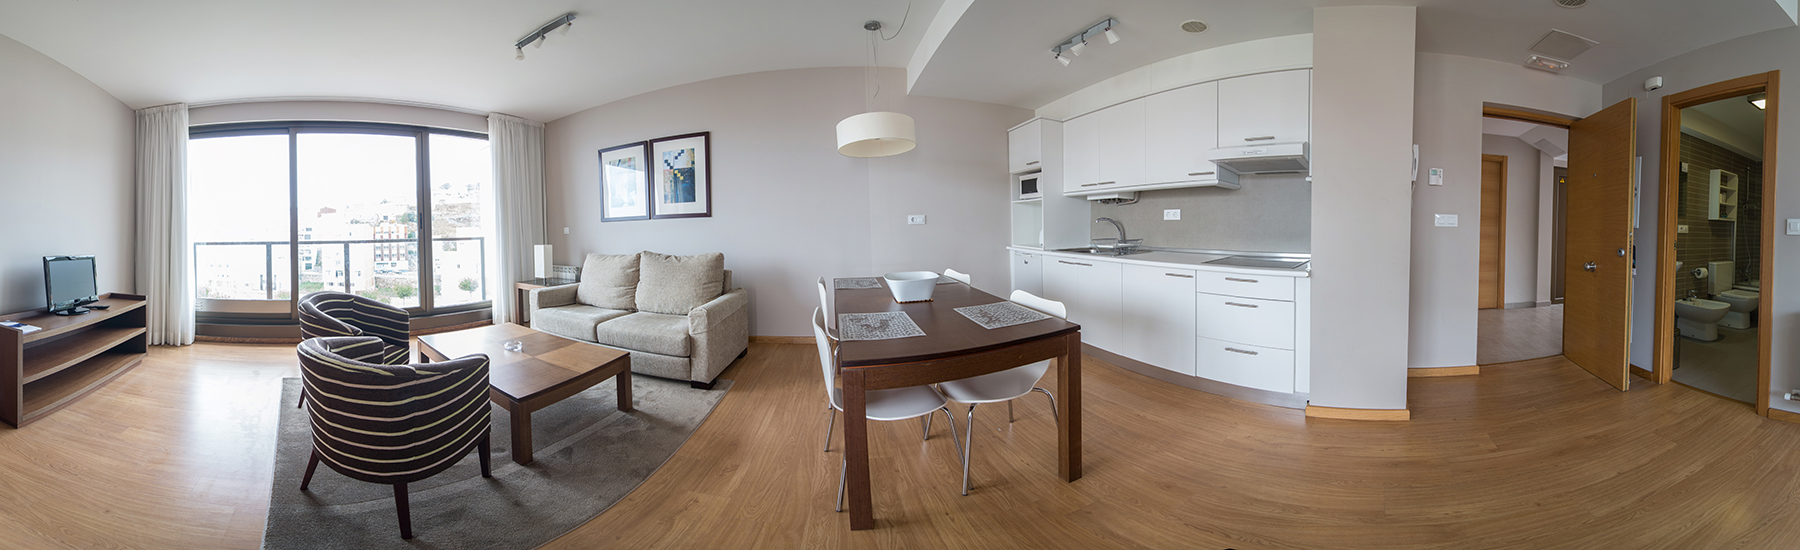 Apartemento 360º